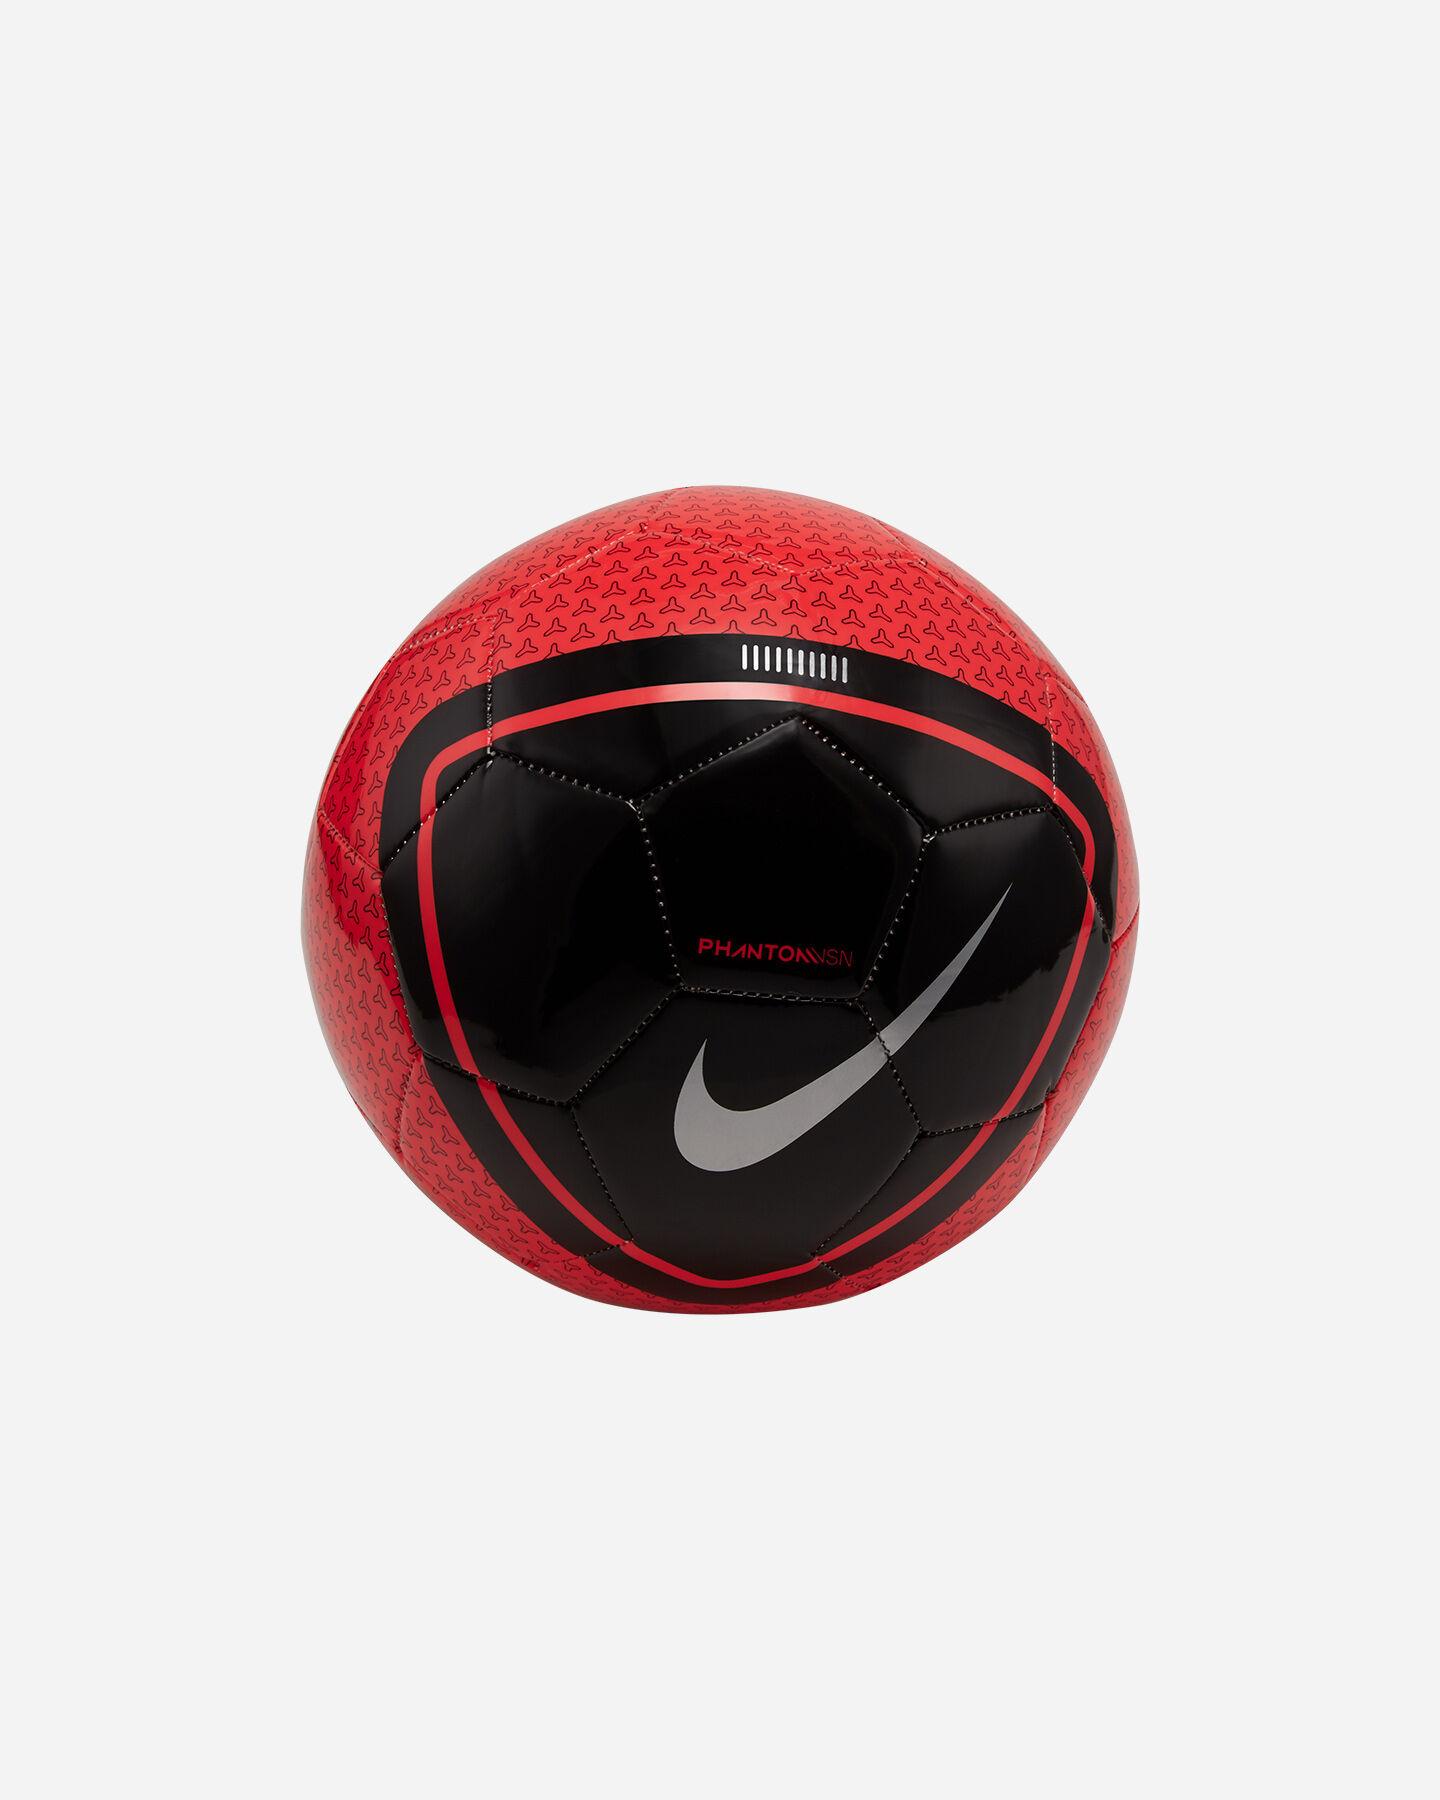 Pallone calcio NIKE PHANTOM VISION S5165466|644|5 scatto 1